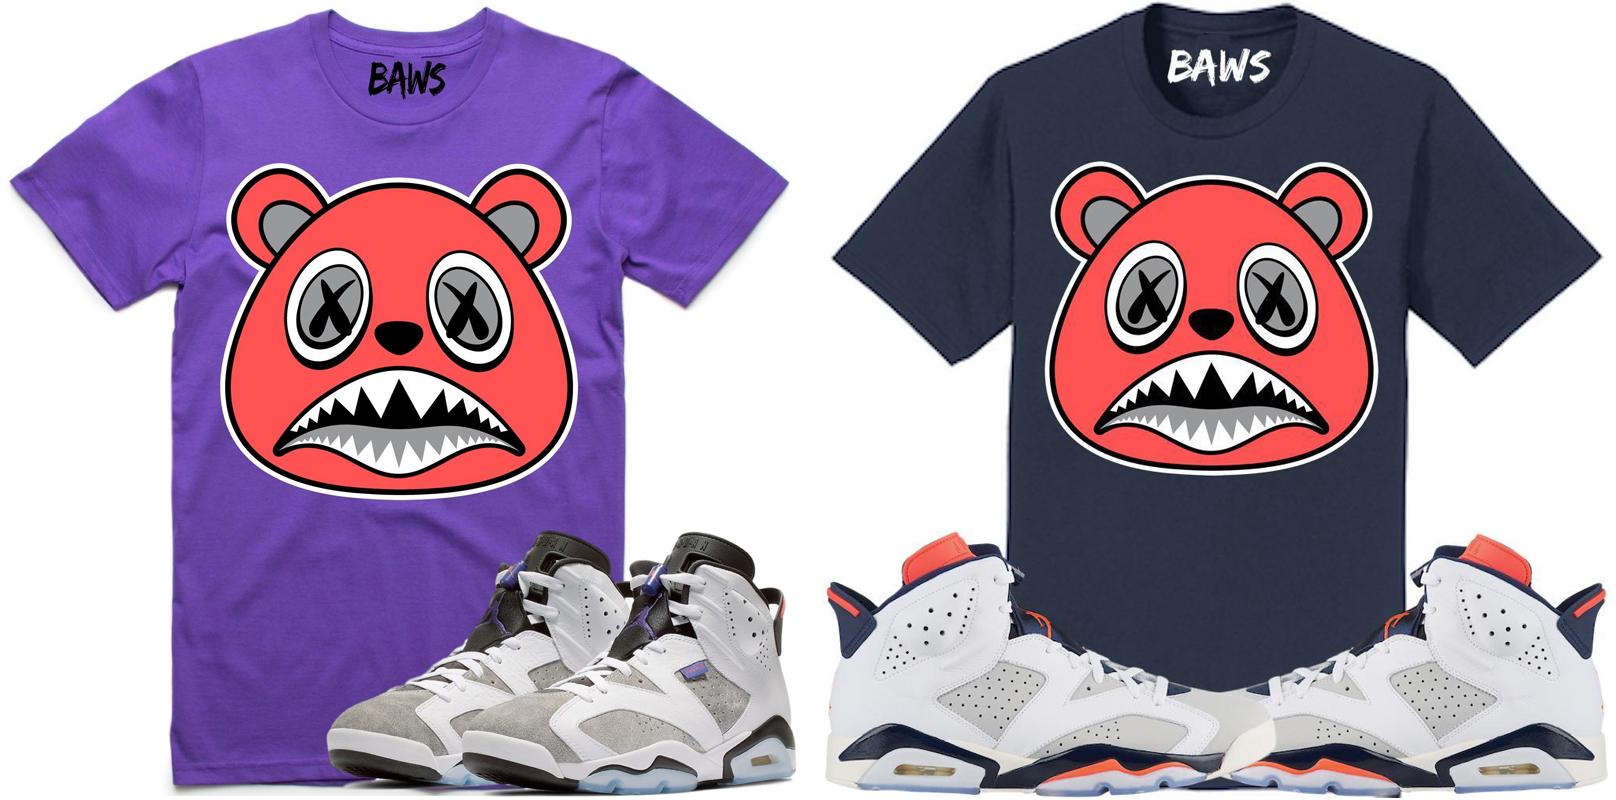 db969985954 Jordan 6 Flint Tinker BAWS Sneaker Tees | SneakerFits.com